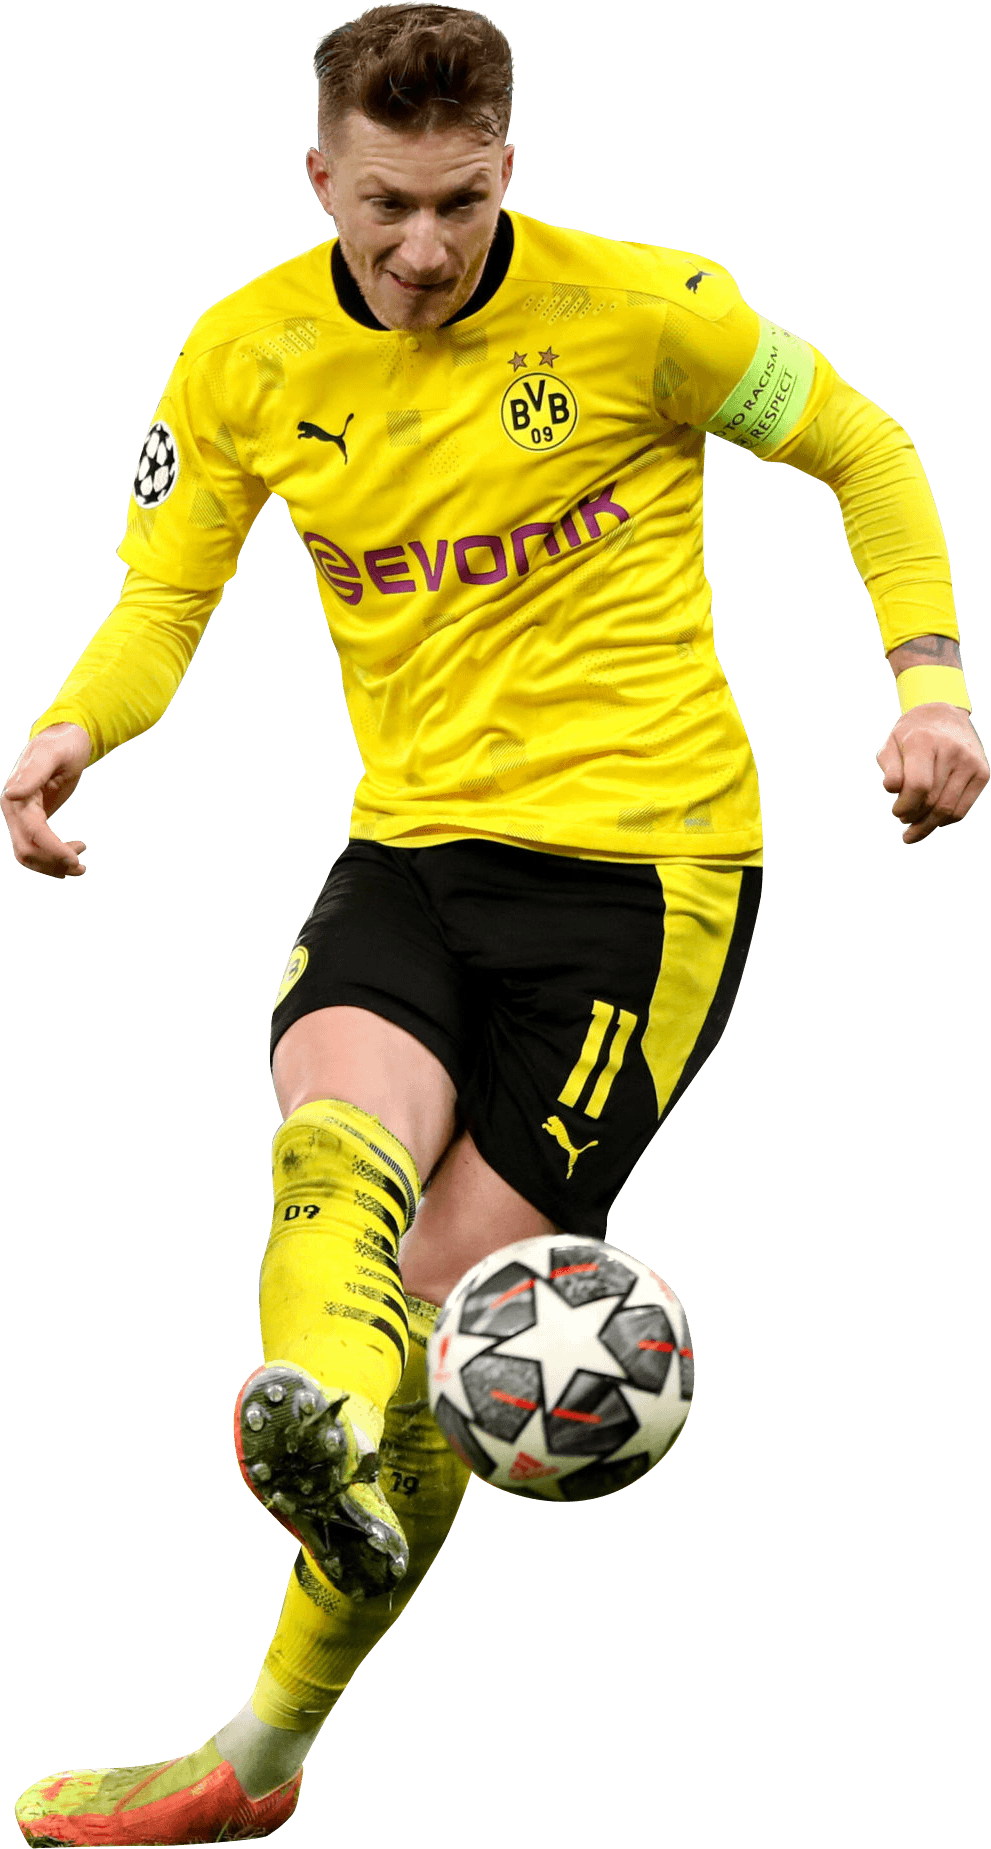 Marco Reusrender